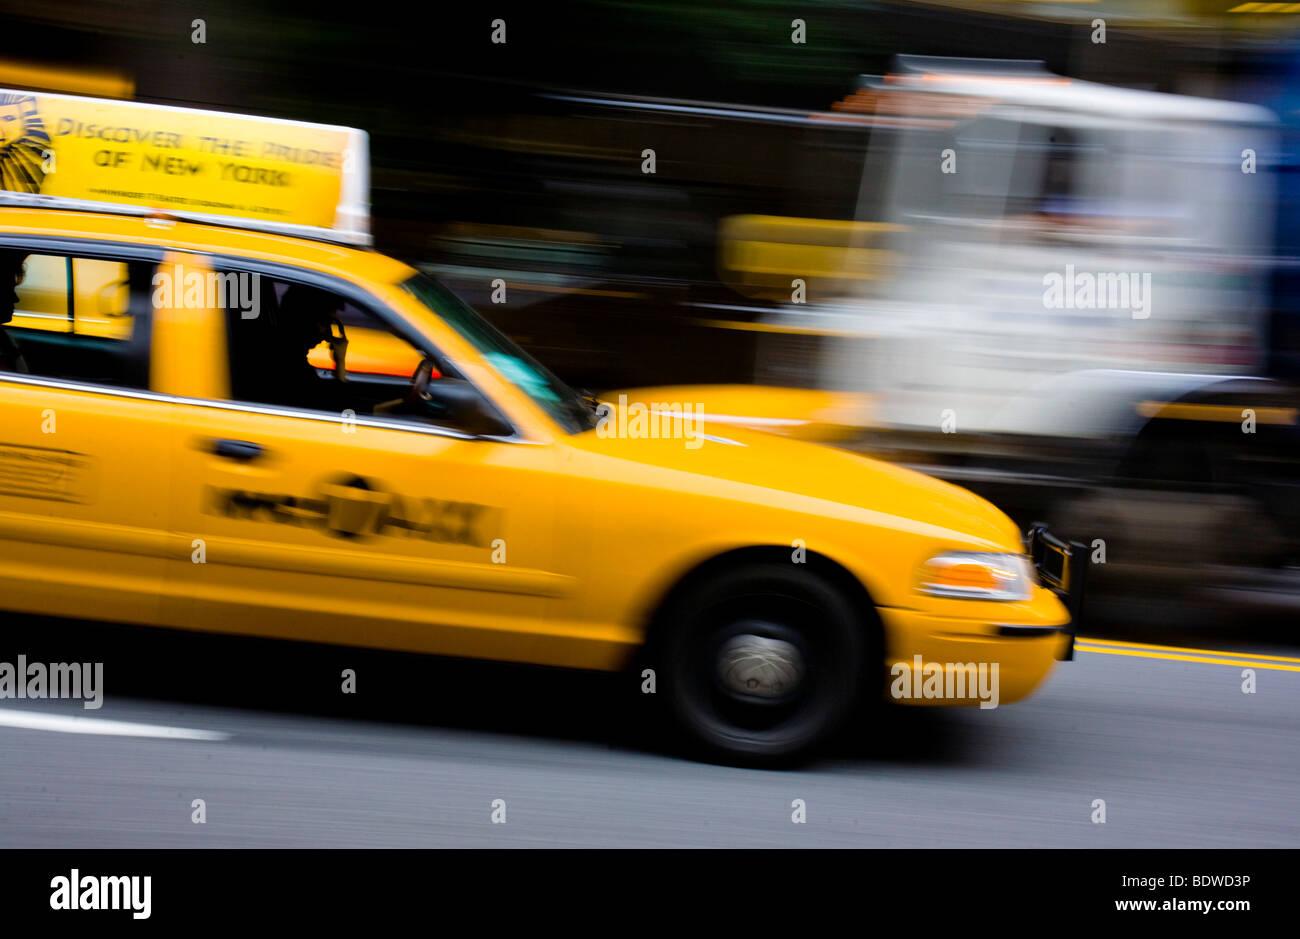 Taxi driving, Manhattan, New York City, USA - Stock Image